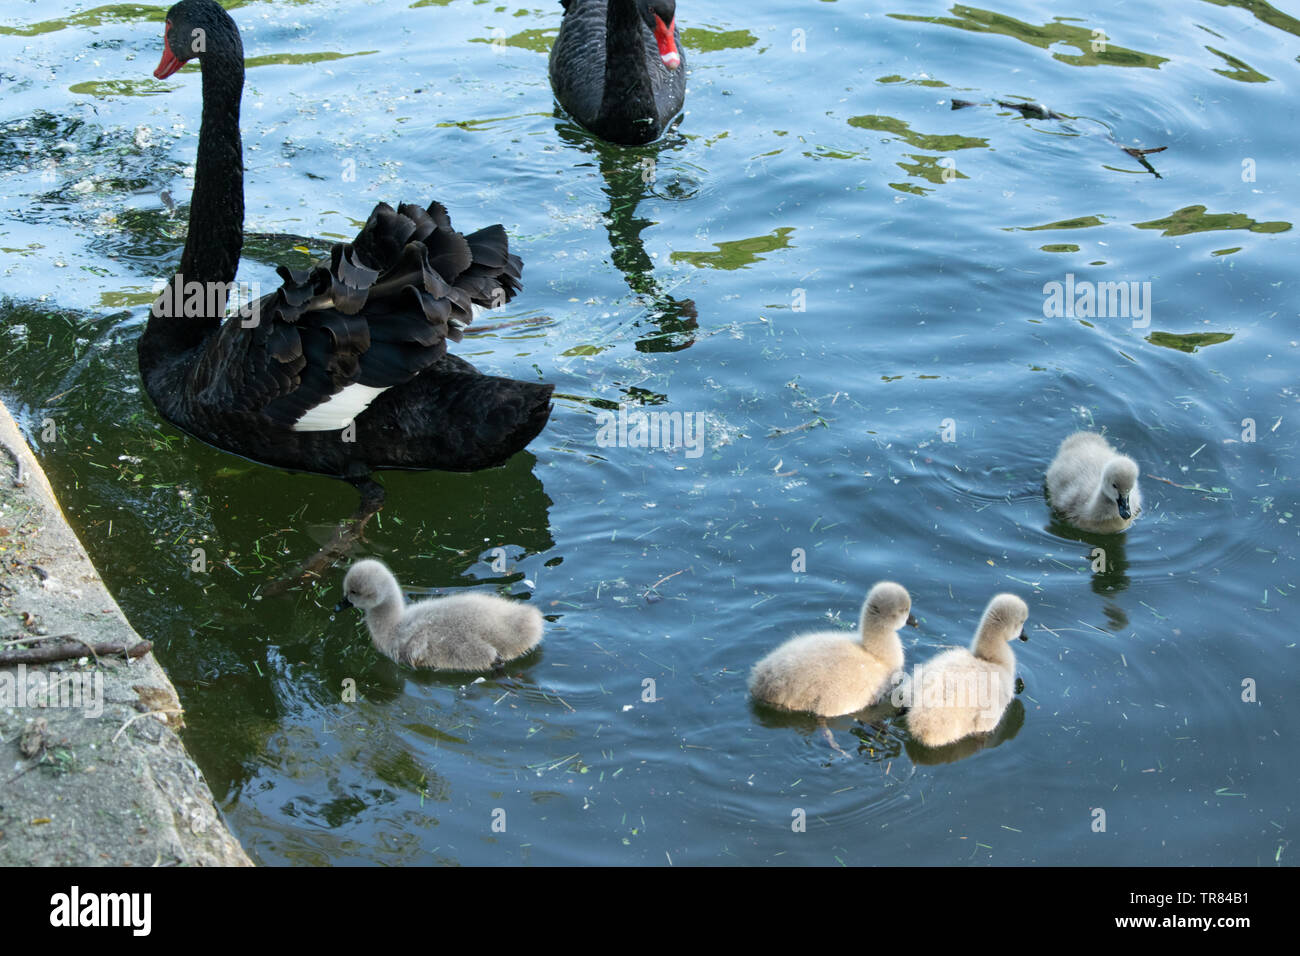 Black swans with their chicks. Animal wildlife Stock Photo